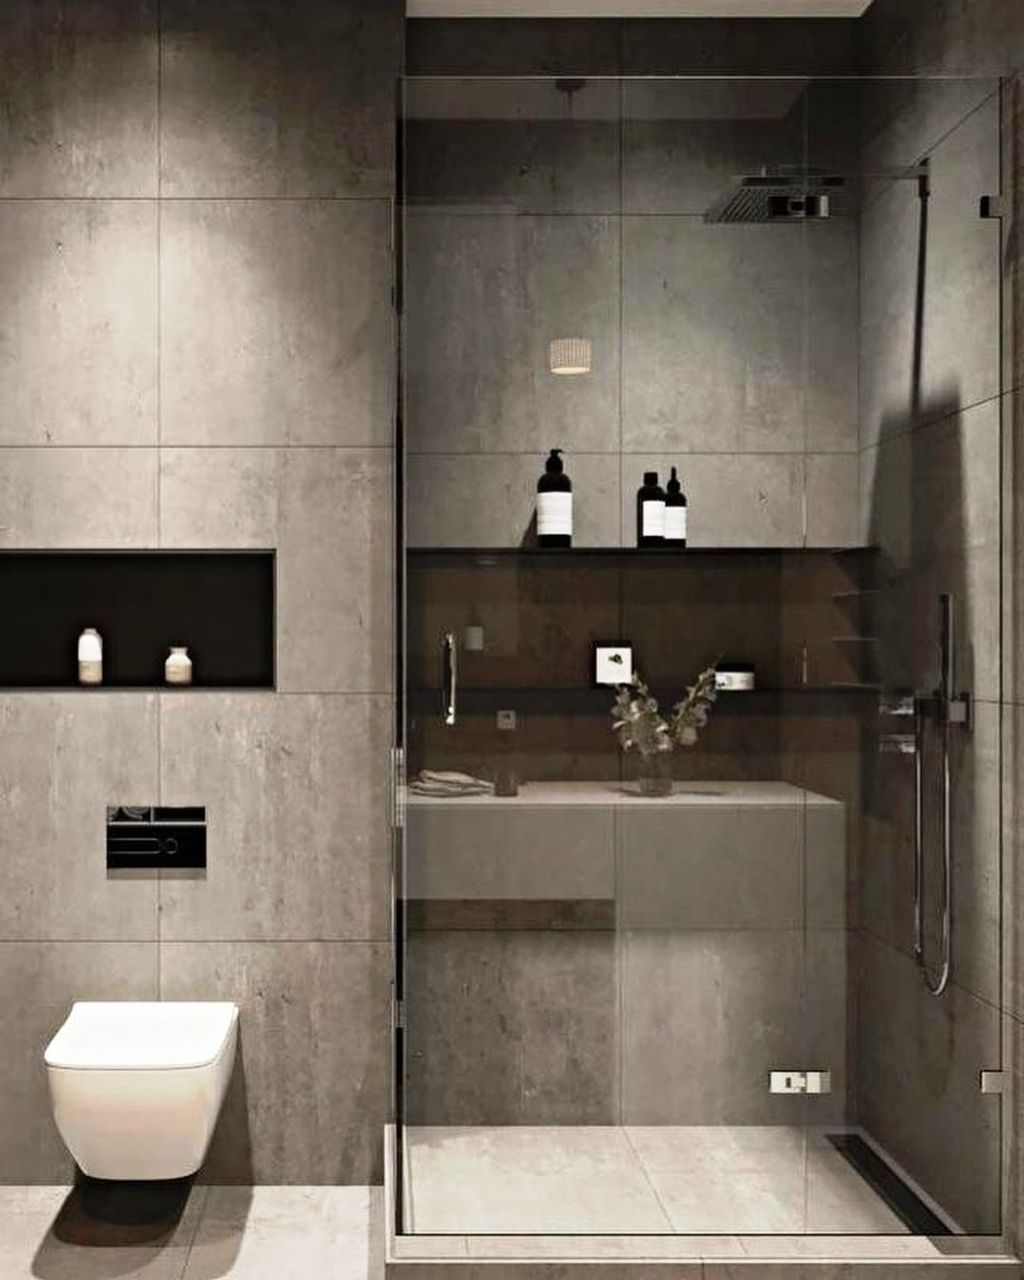 ديكورات حمامات فاخرة 1 2